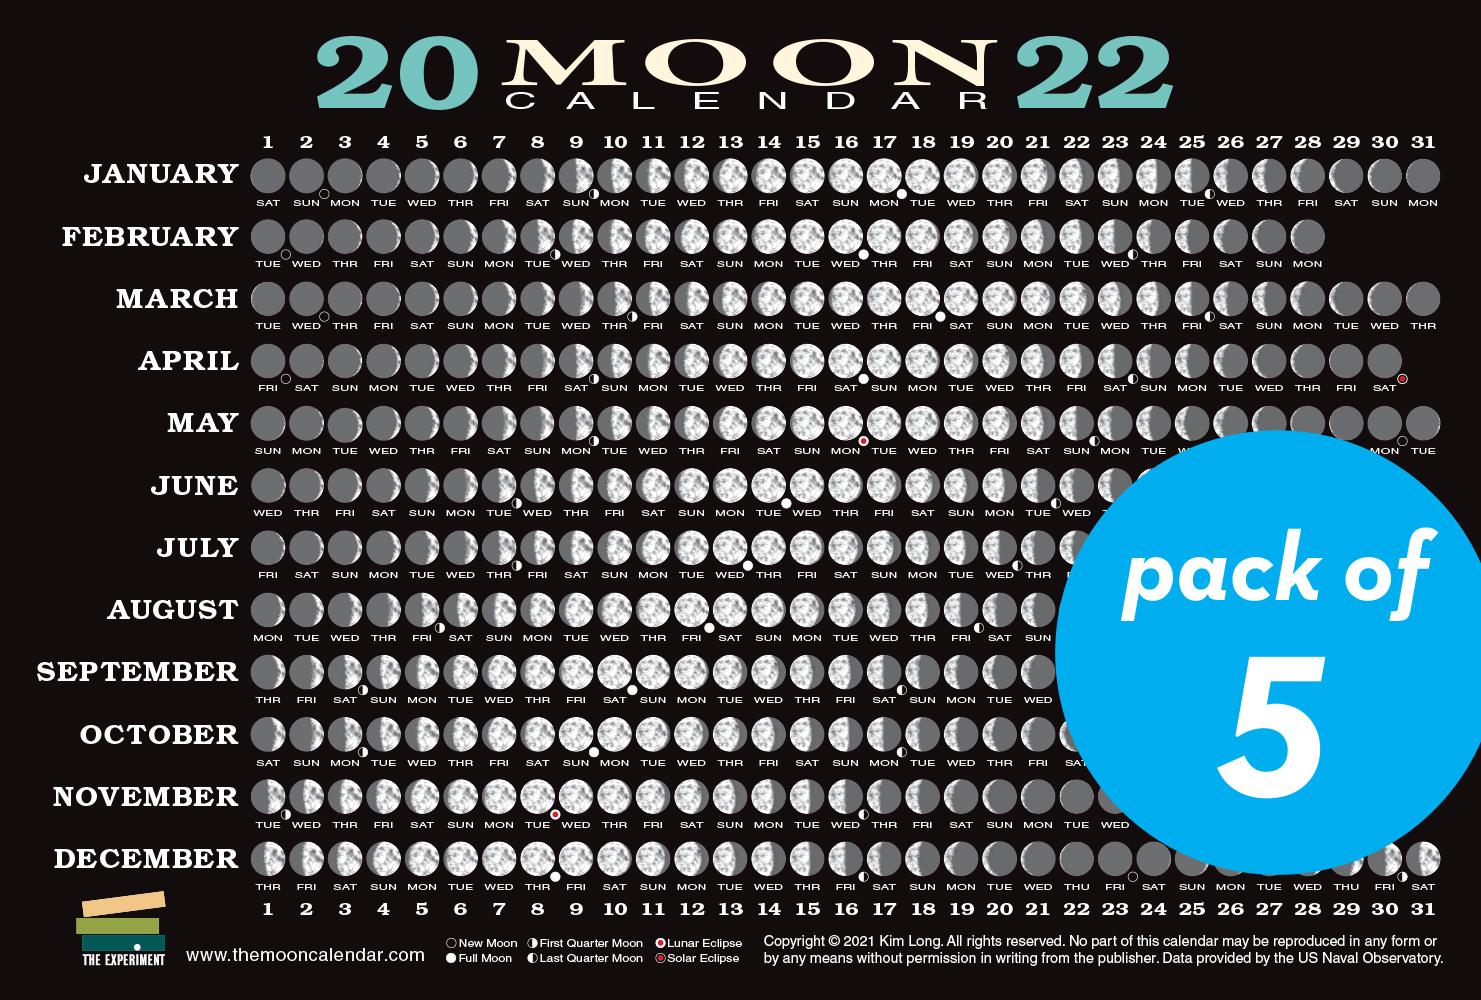 2022 Moon Calendar.2022 Moon Calendar Card 5 Pack Workman Publishing